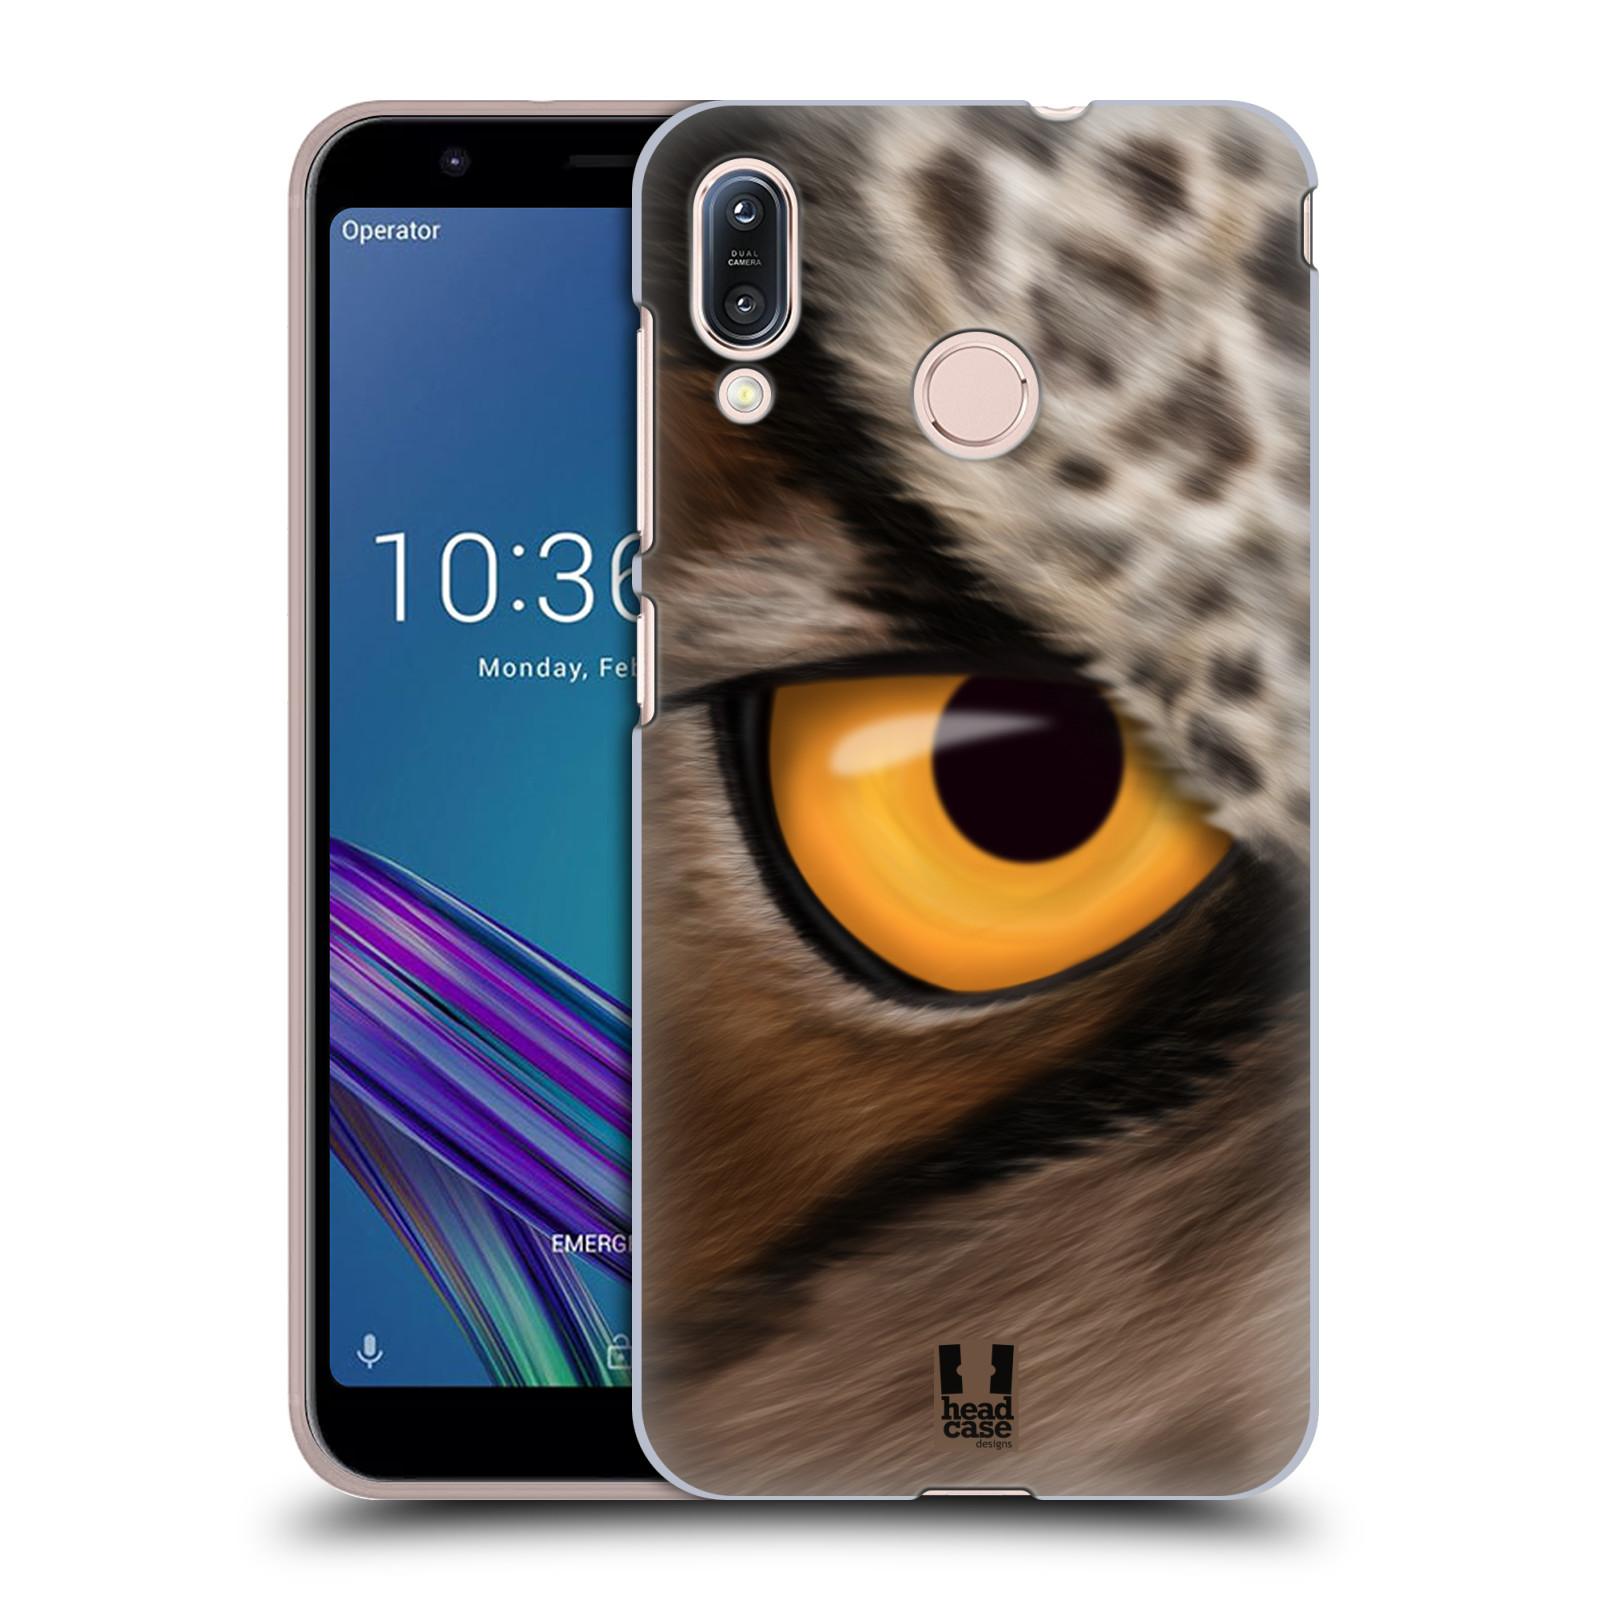 Pouzdro na mobil Asus Zenfone Max M1 (ZB555KL) - HEAD CASE - vzor pohled zvířete oko sova